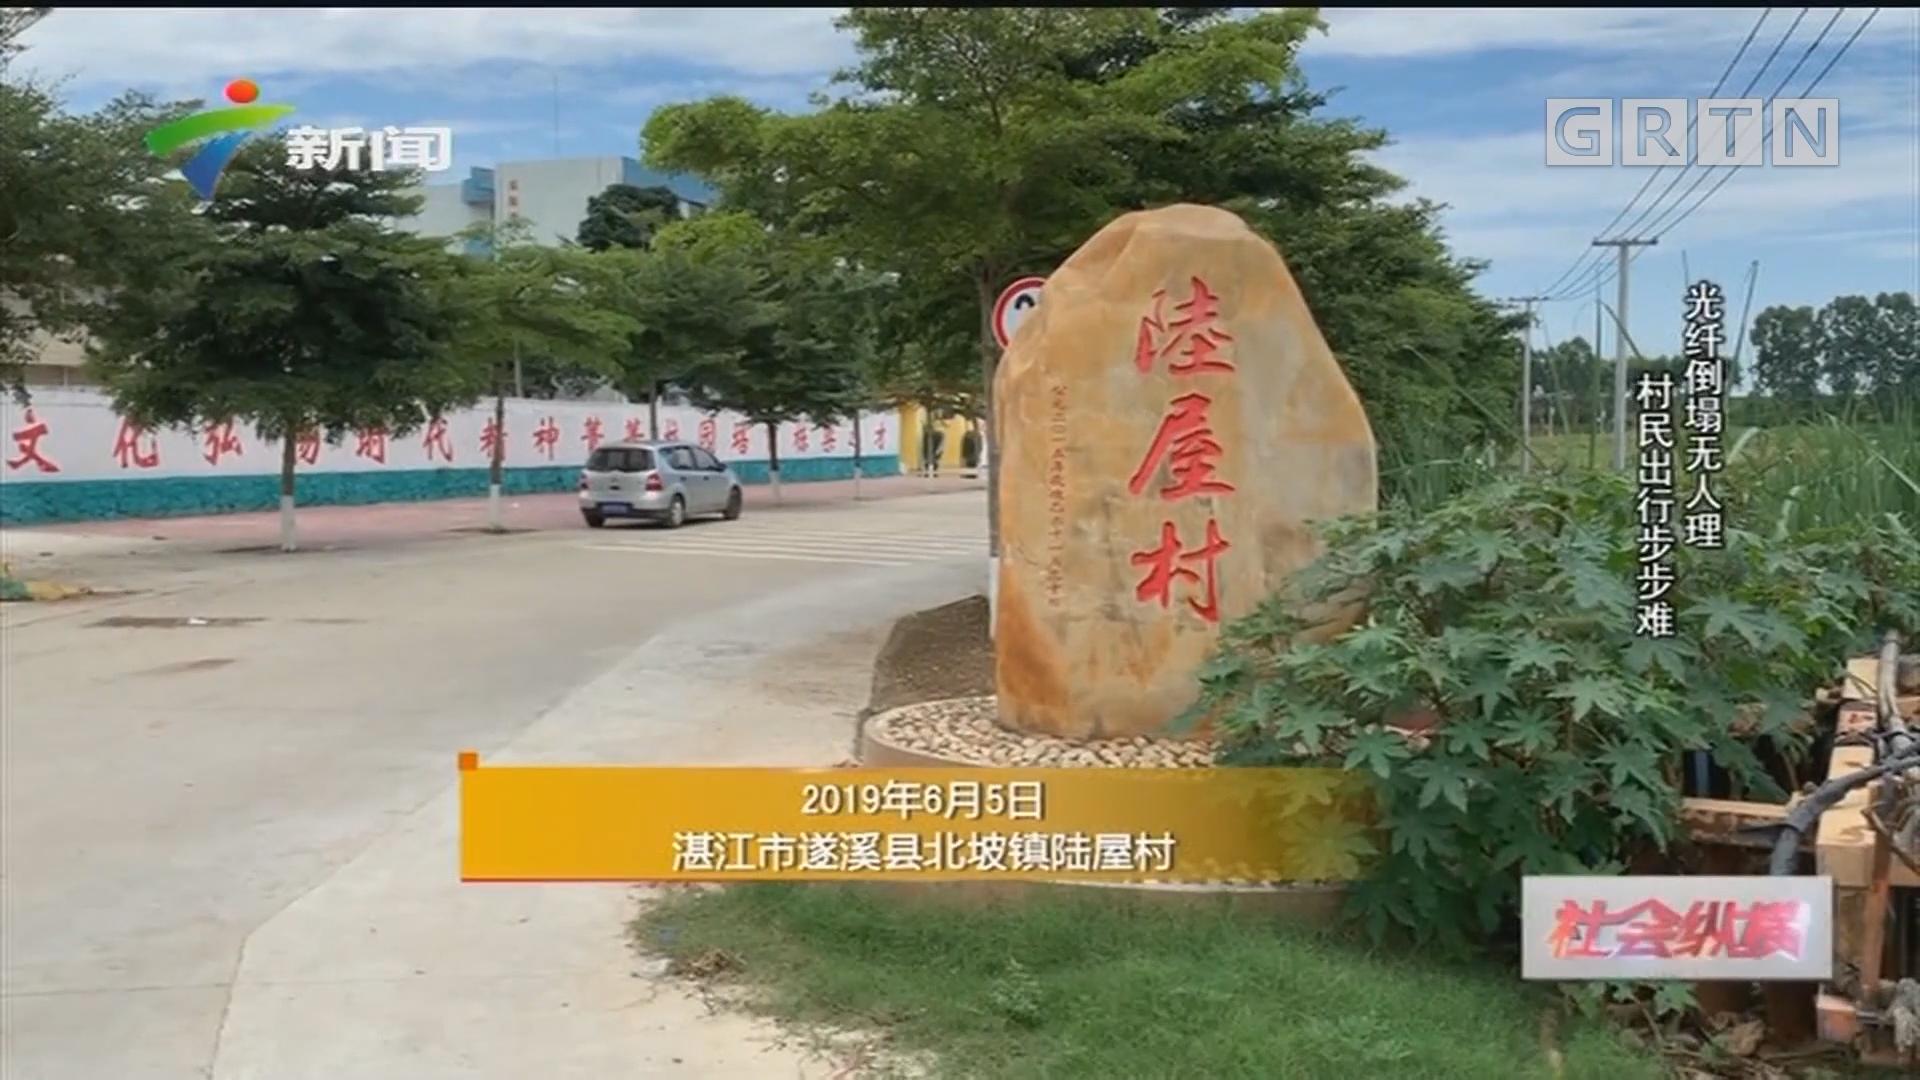 [HD][2019-06-17]社會縱橫:光纖倒塌無人理 村民出行步步難